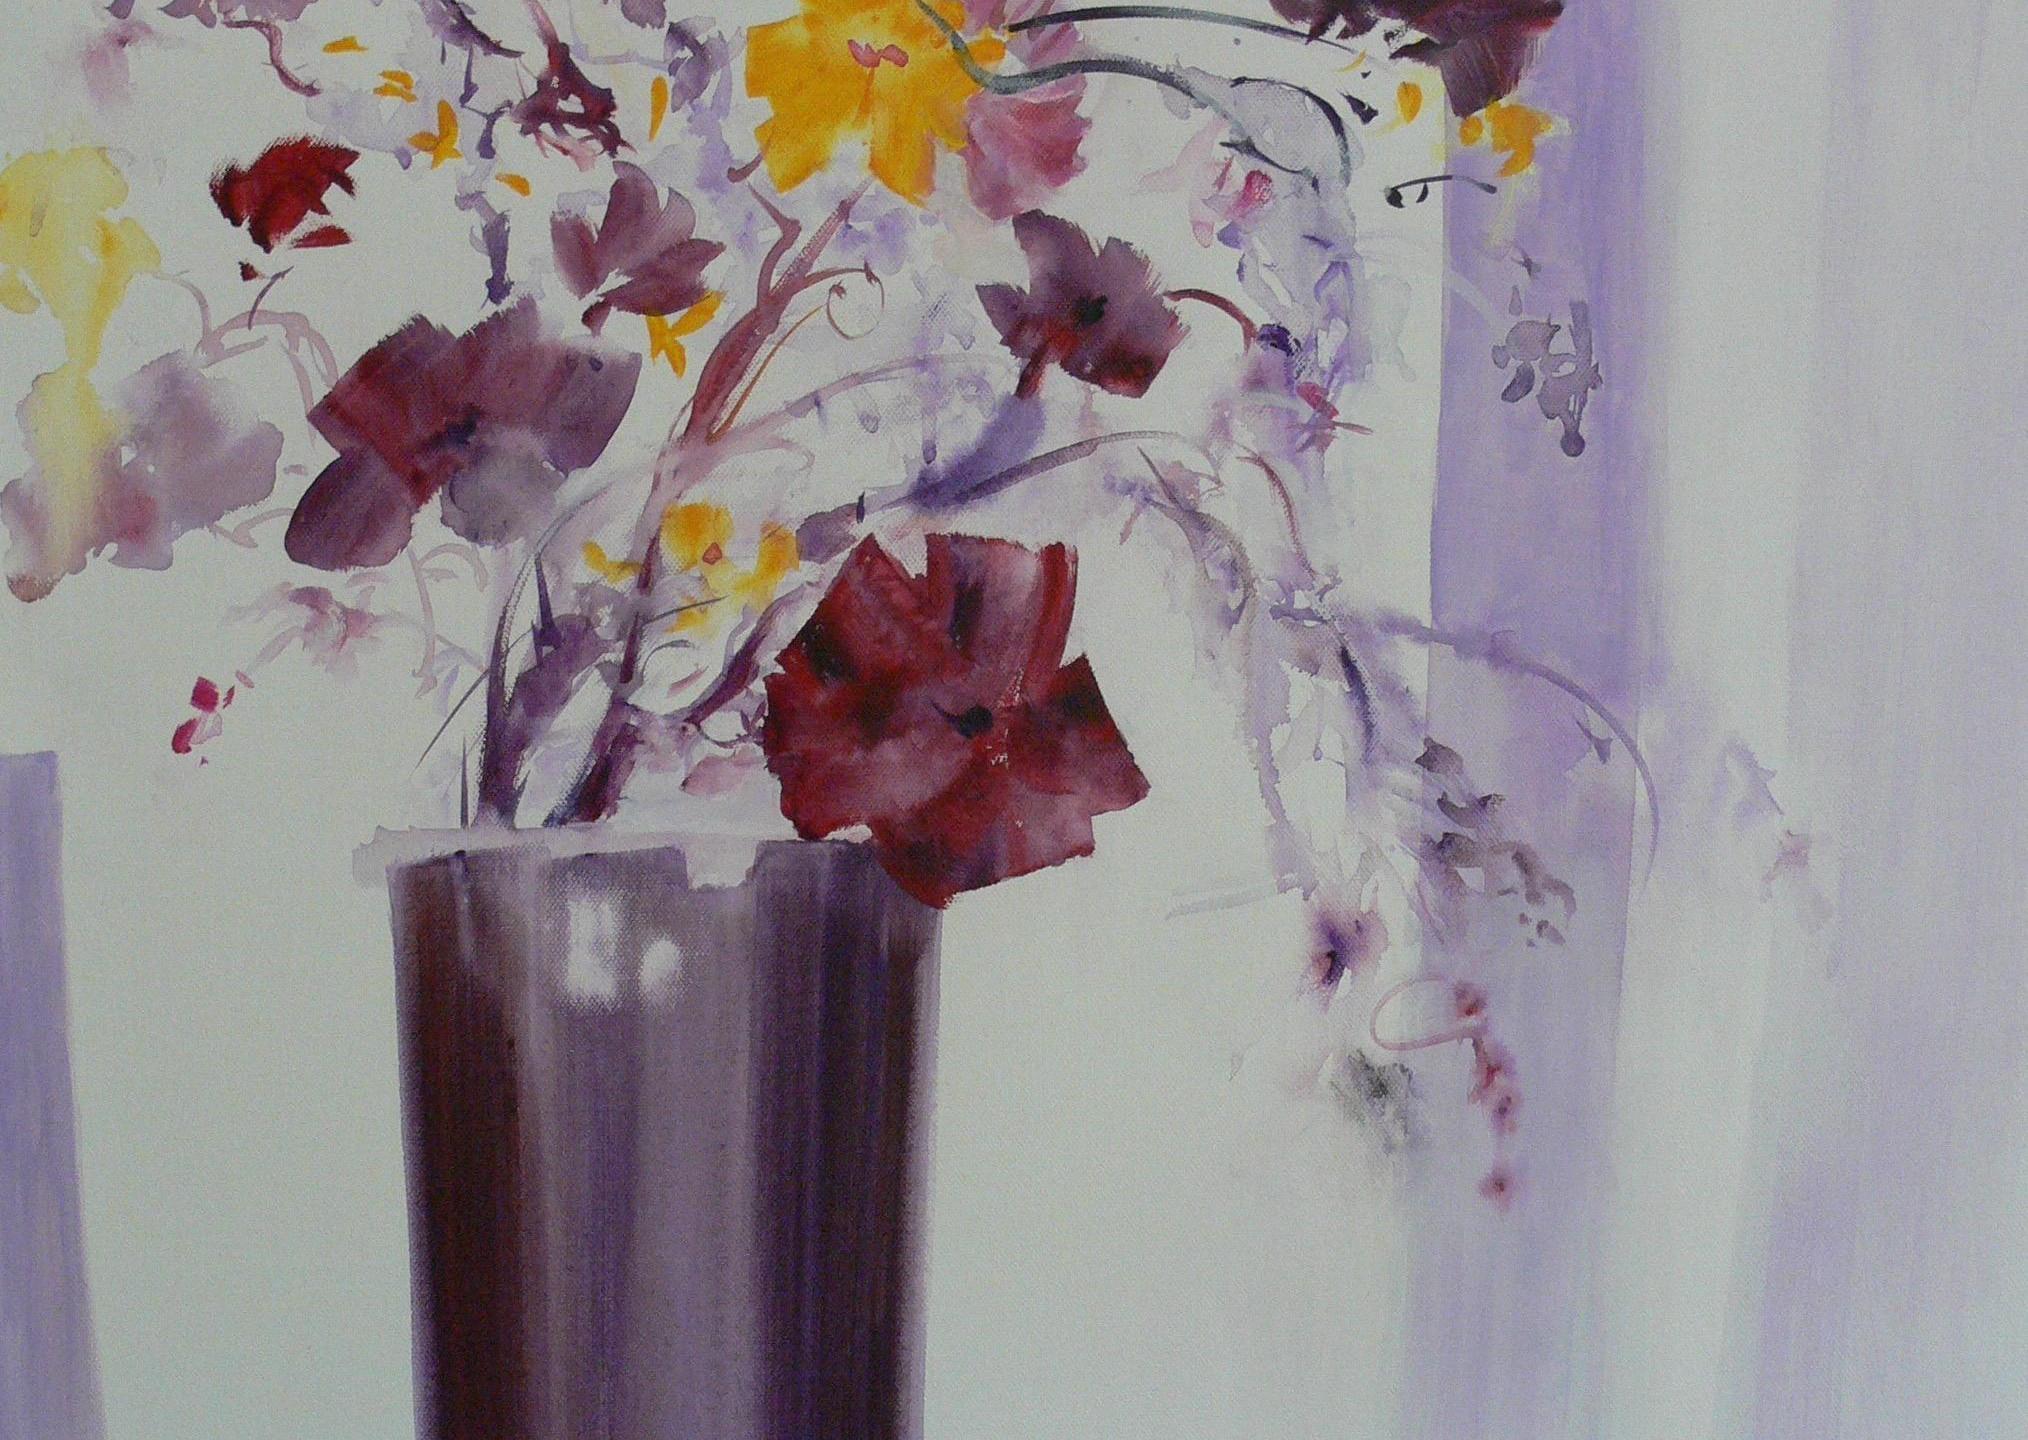 Hilts, Laura - Window Bouquet